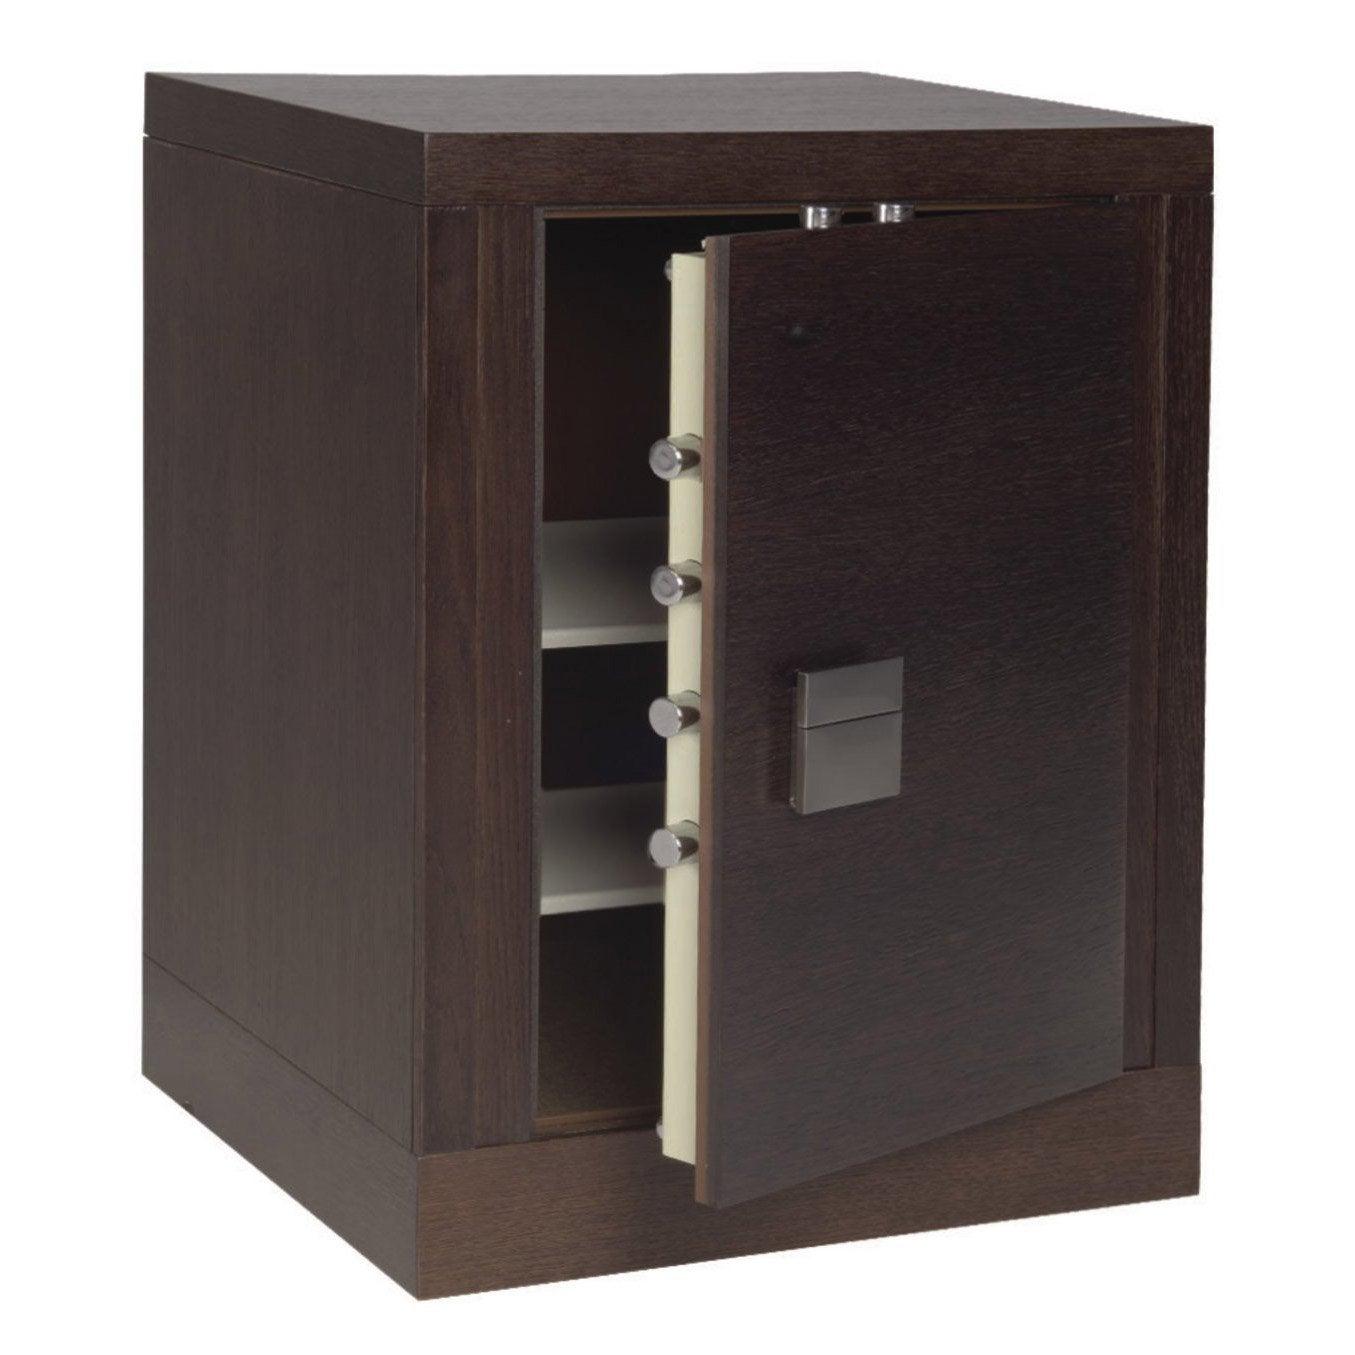 coffre fort haute s curit cl stark moderne 309mcw h96. Black Bedroom Furniture Sets. Home Design Ideas